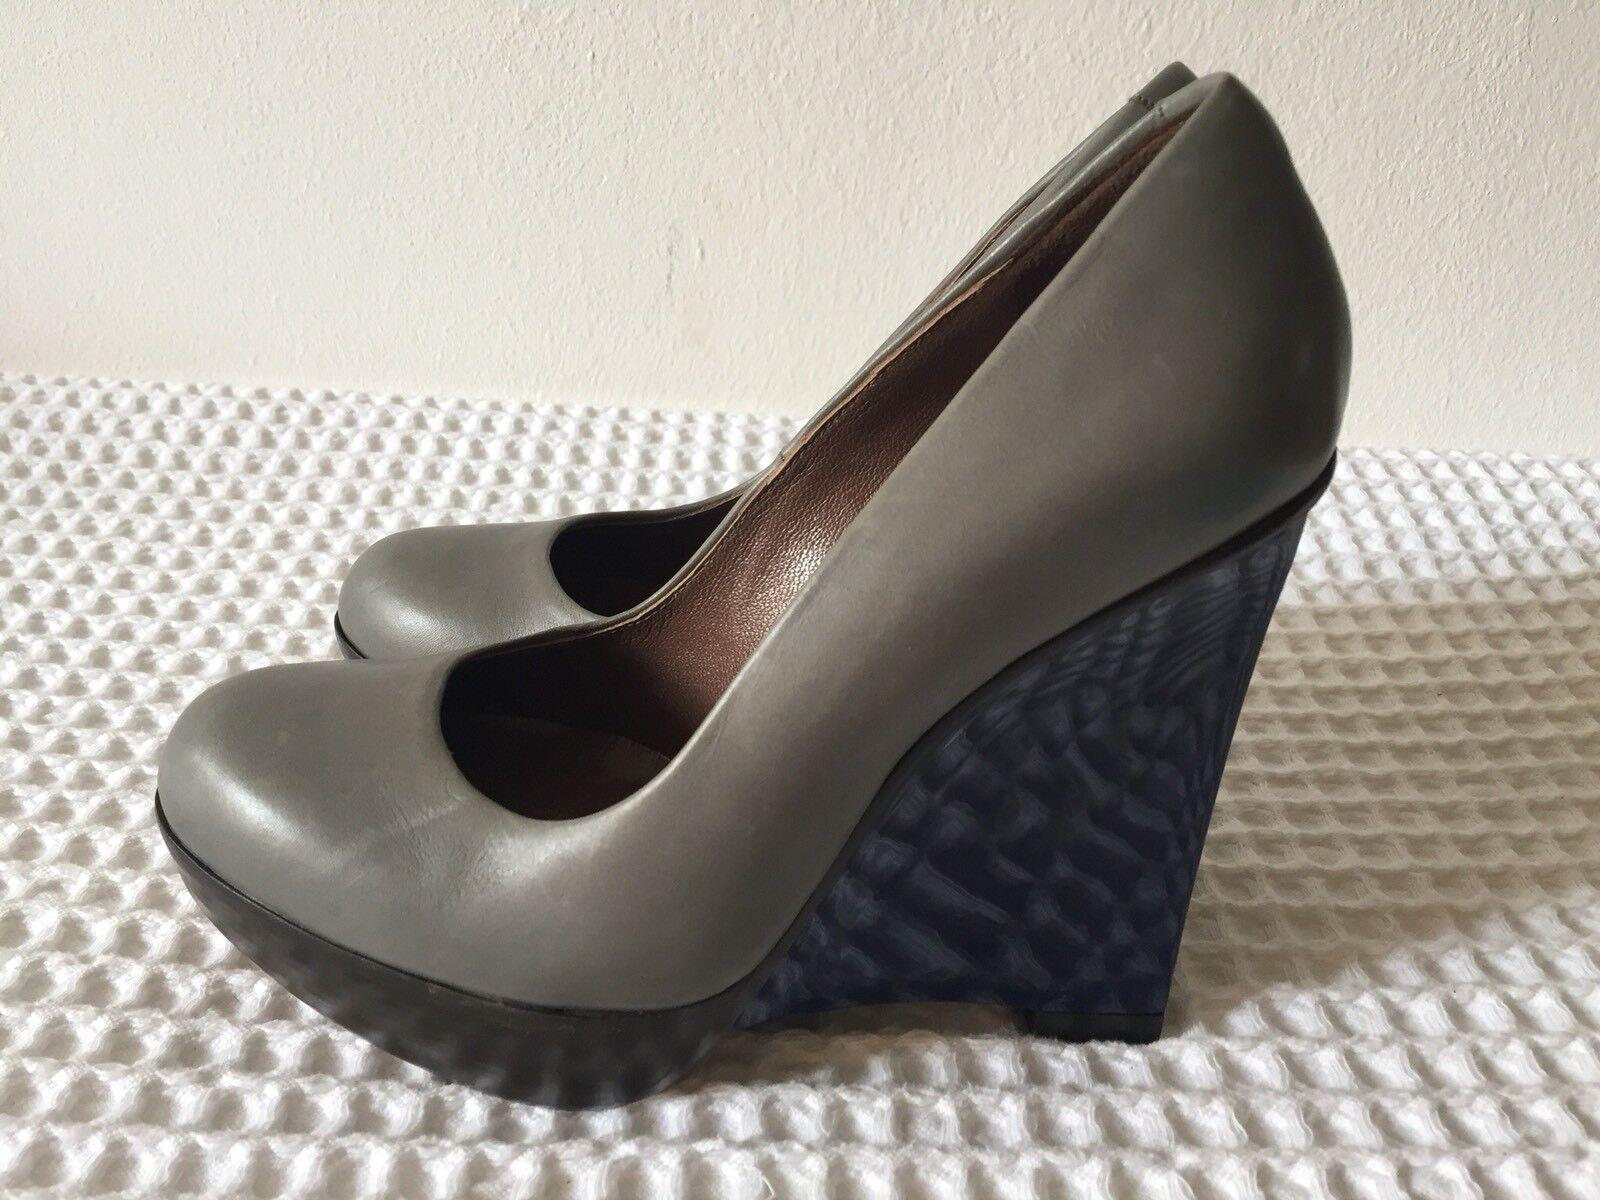 MARNI grau leather FULL schuhe WITH Blau unique heels Größe Größe Größe 37 Eu UK 4 63a74c